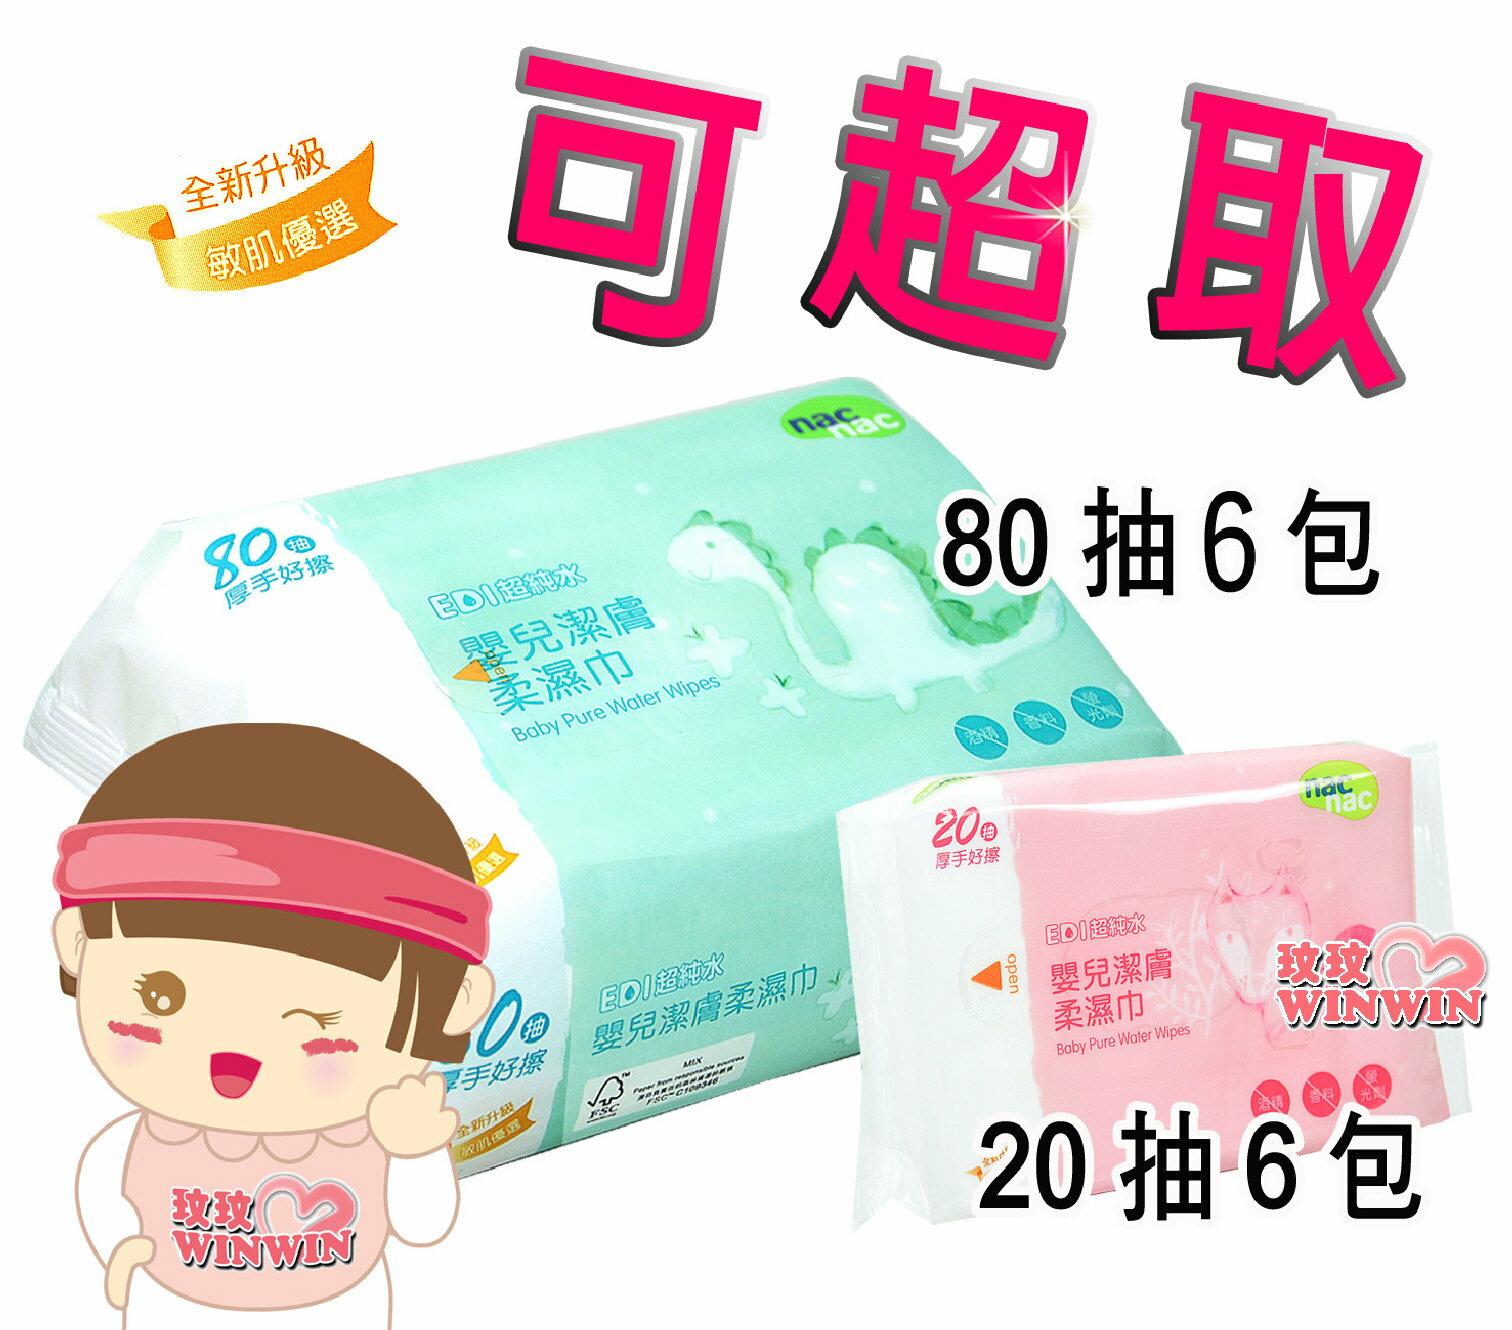 NacNac嬰兒潔膚柔濕巾「NacNac濕紙巾80抽x6包+隨身包20抽x6包」,贈多次貼濕巾蓋2個